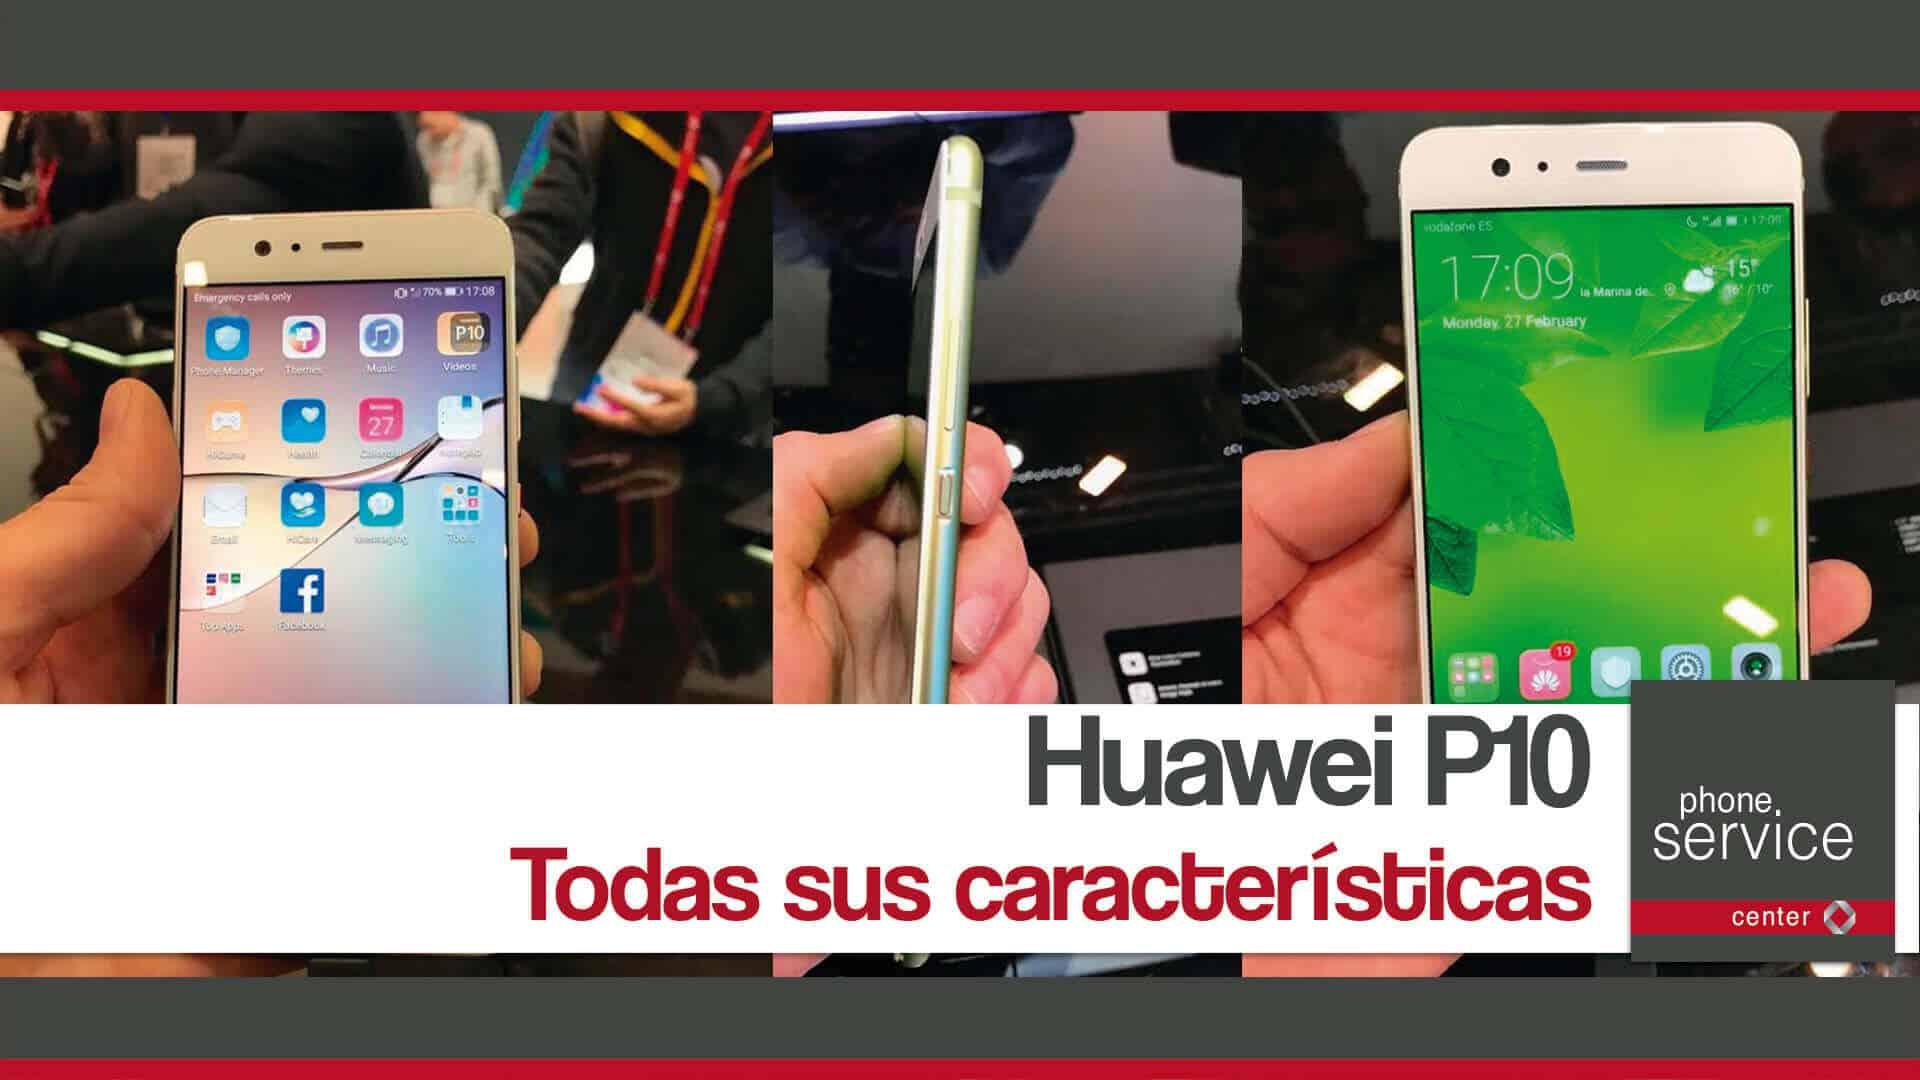 Huawei P10 todas sus caracteristicas